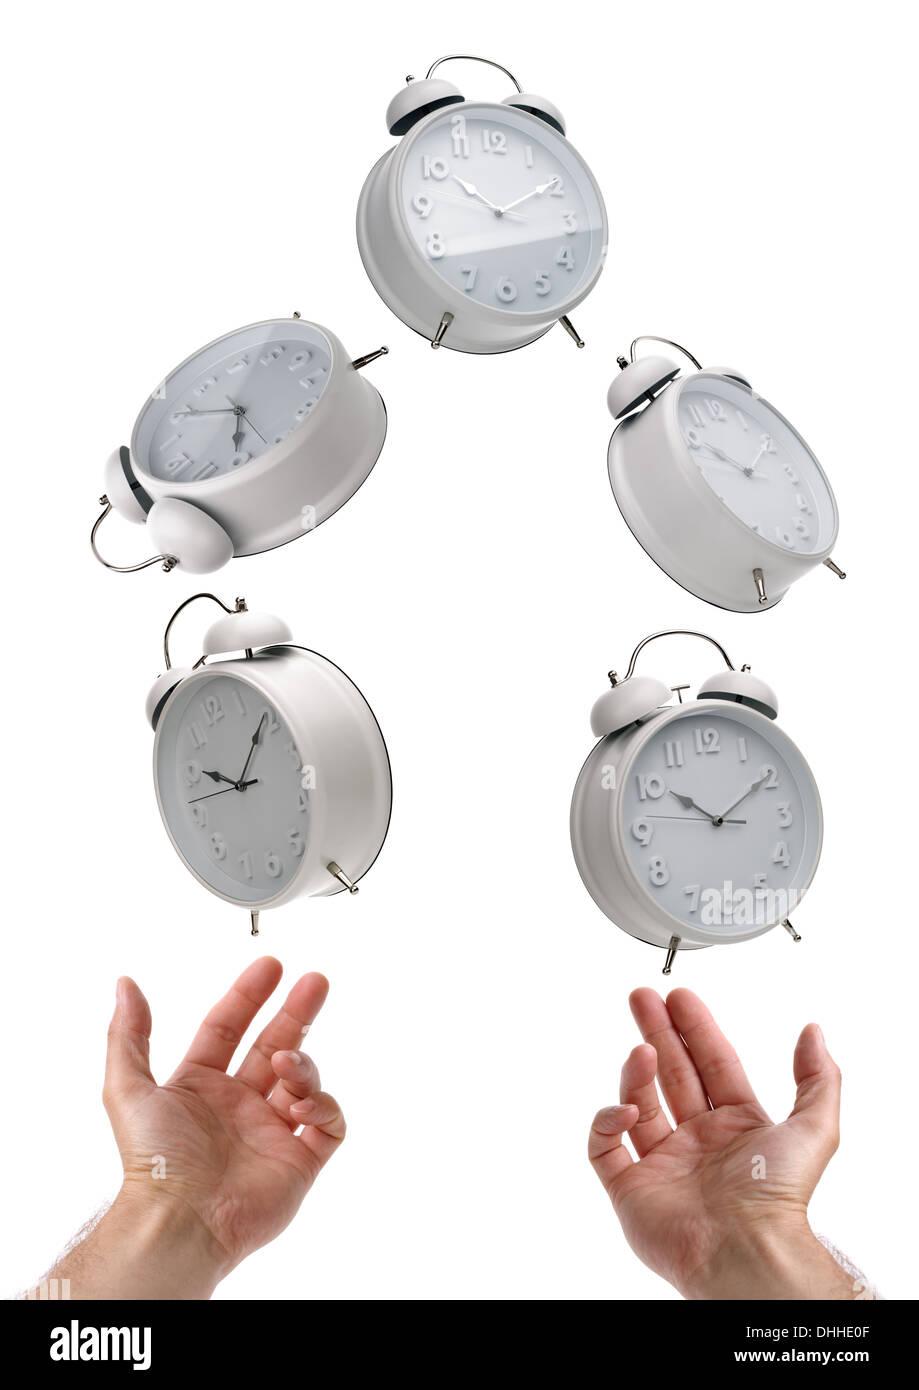 Juggling time - Stock Image